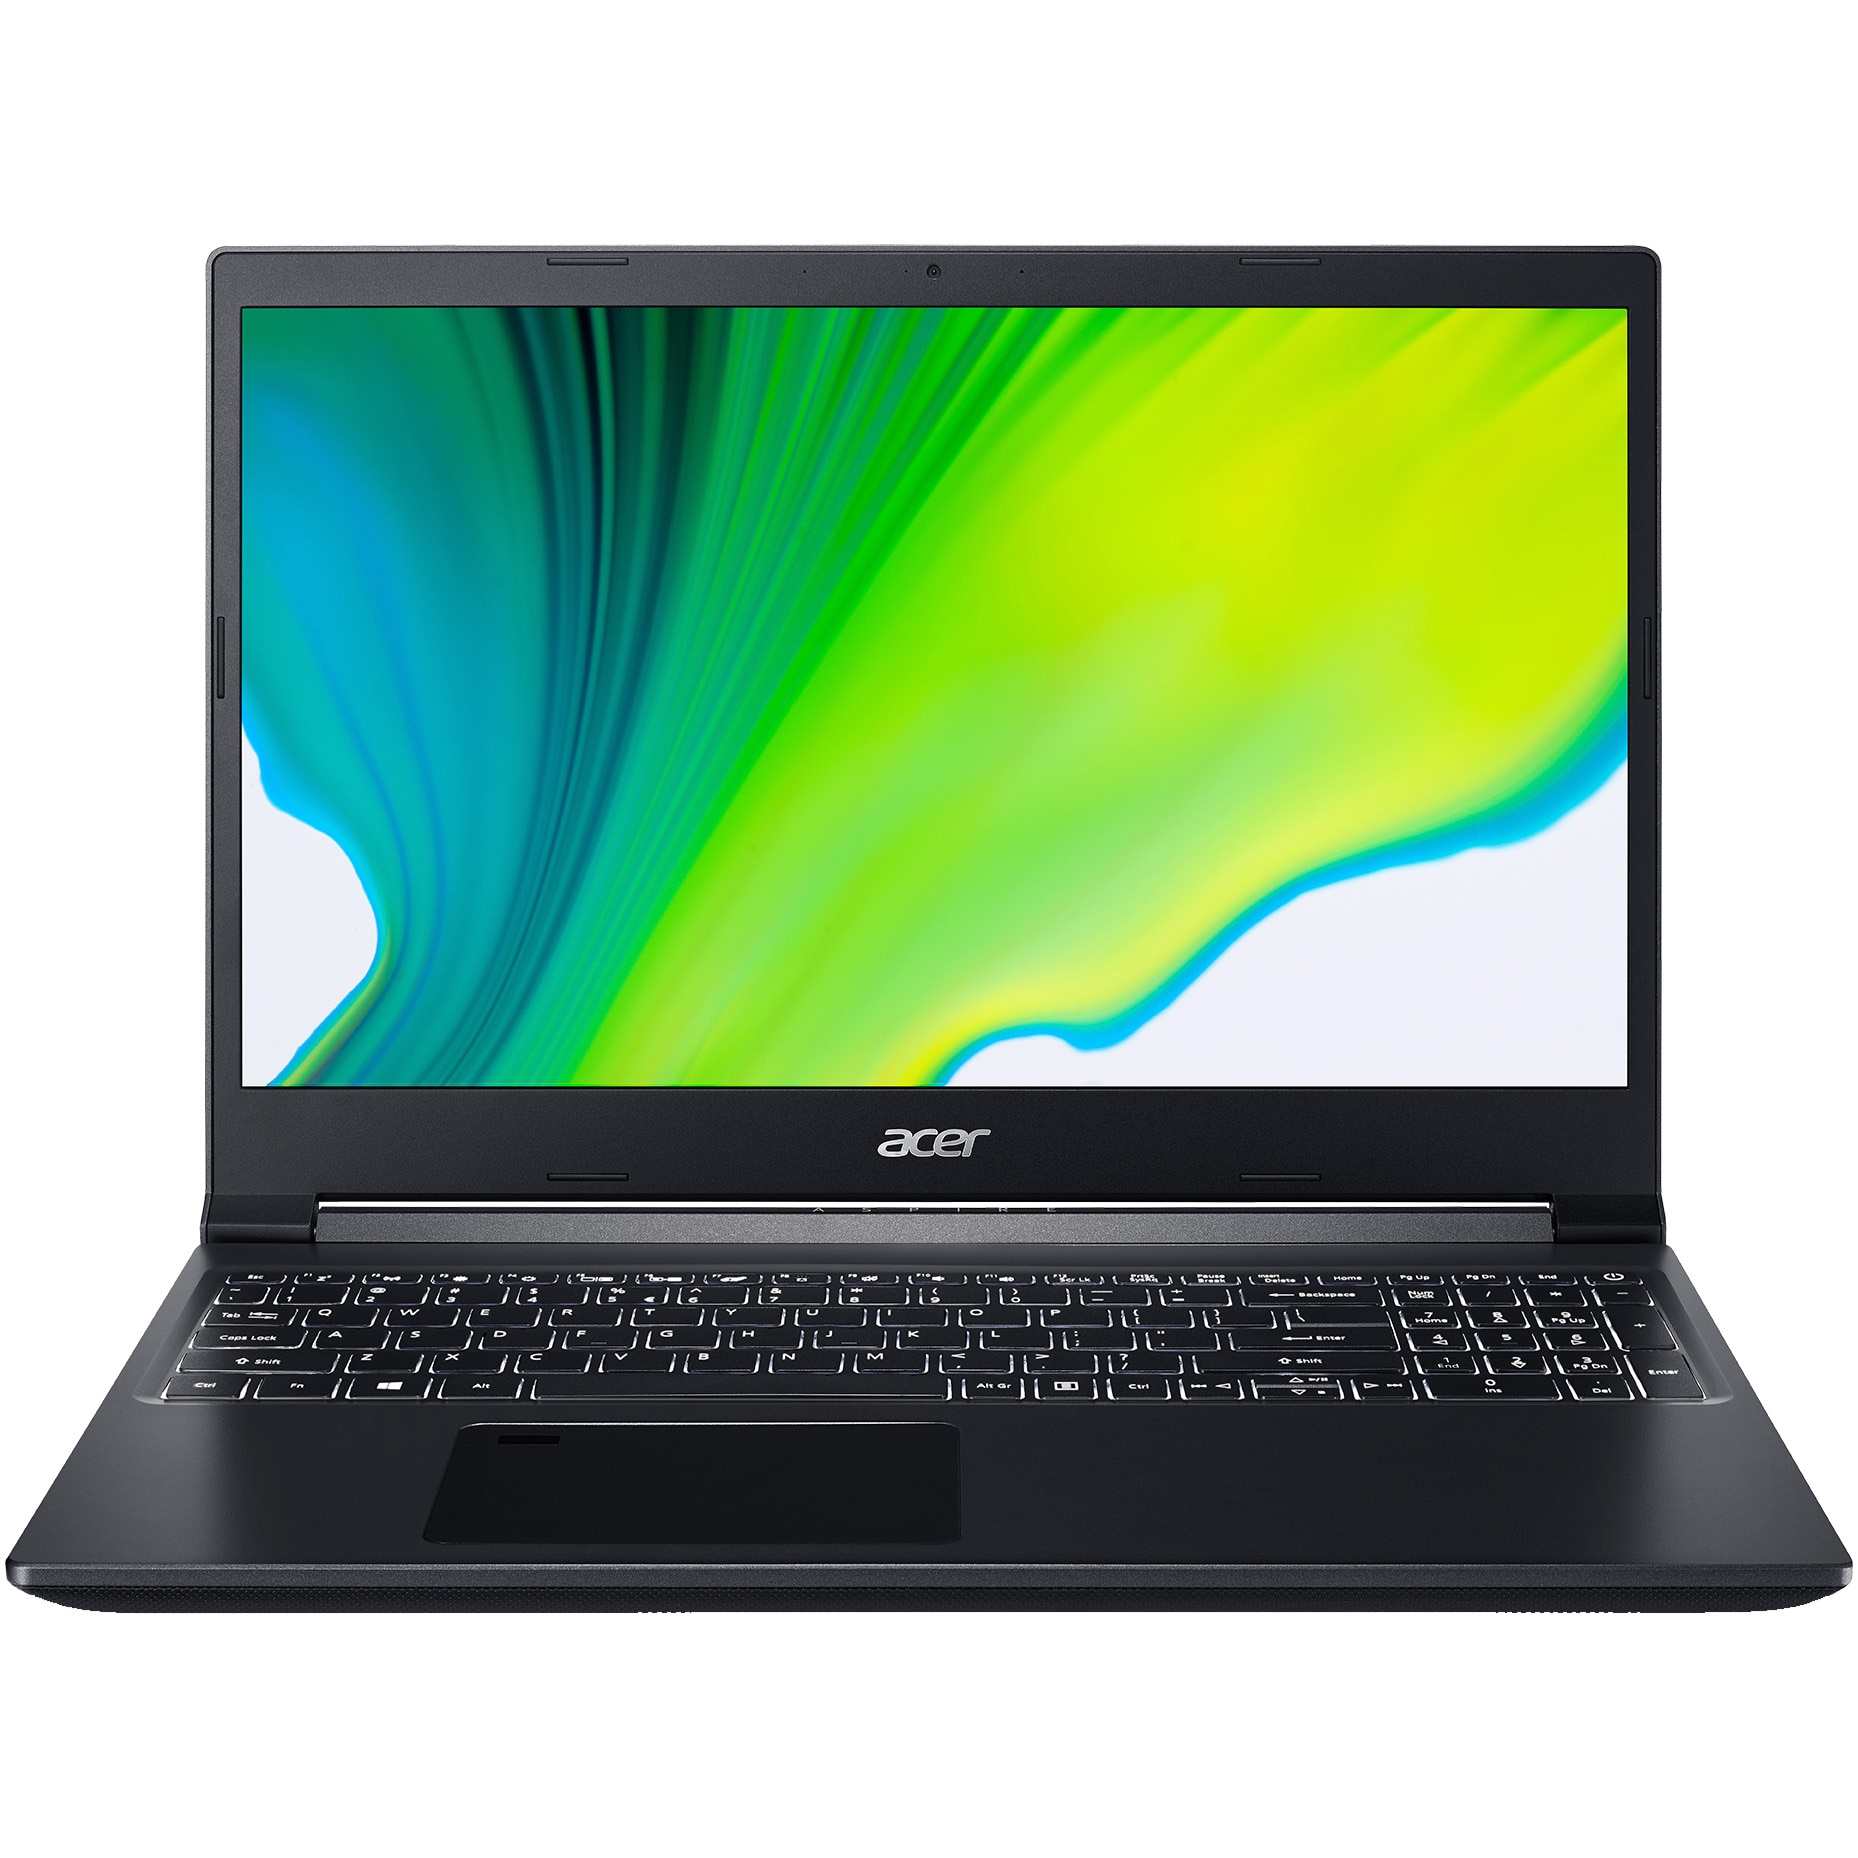 "Fotografie Laptop Gaming Acer Aspire 7 A715 cu procesor AMD Ryzen 7 3750H, 15.6"", Full HD, 8GB, 512GB SSD, NVIDIA® GeForce® GTX 1650Ti 4GB, No OS, Black"